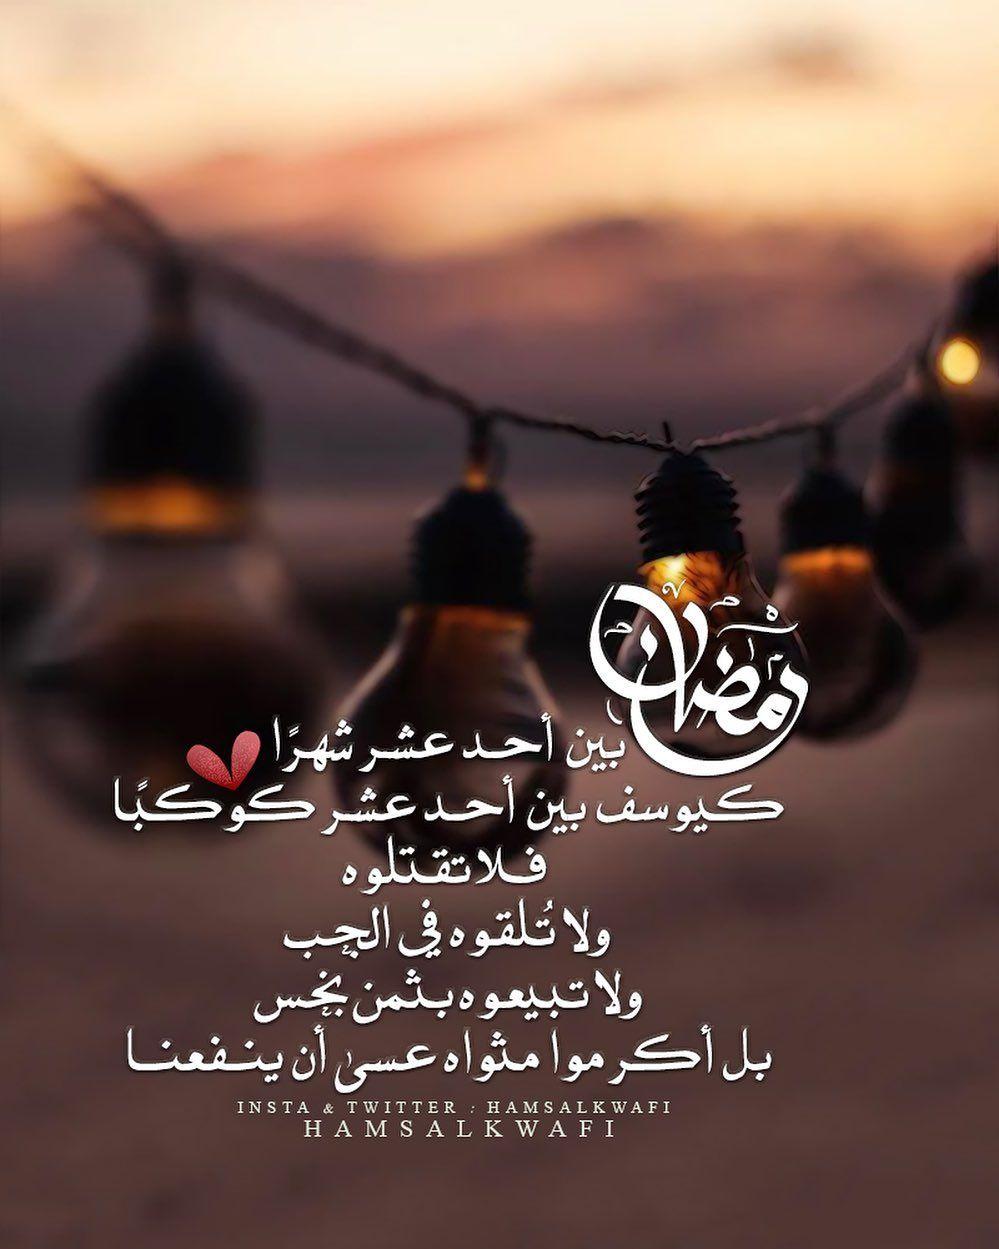 920 Likes 16 Comments كہ ن ذا أثہ ـر Hamsalkwafi On Instagram رمضان نور على المآذن ونور في القلوب وإن كانت الحياة ت Movie Posters Faith Poster